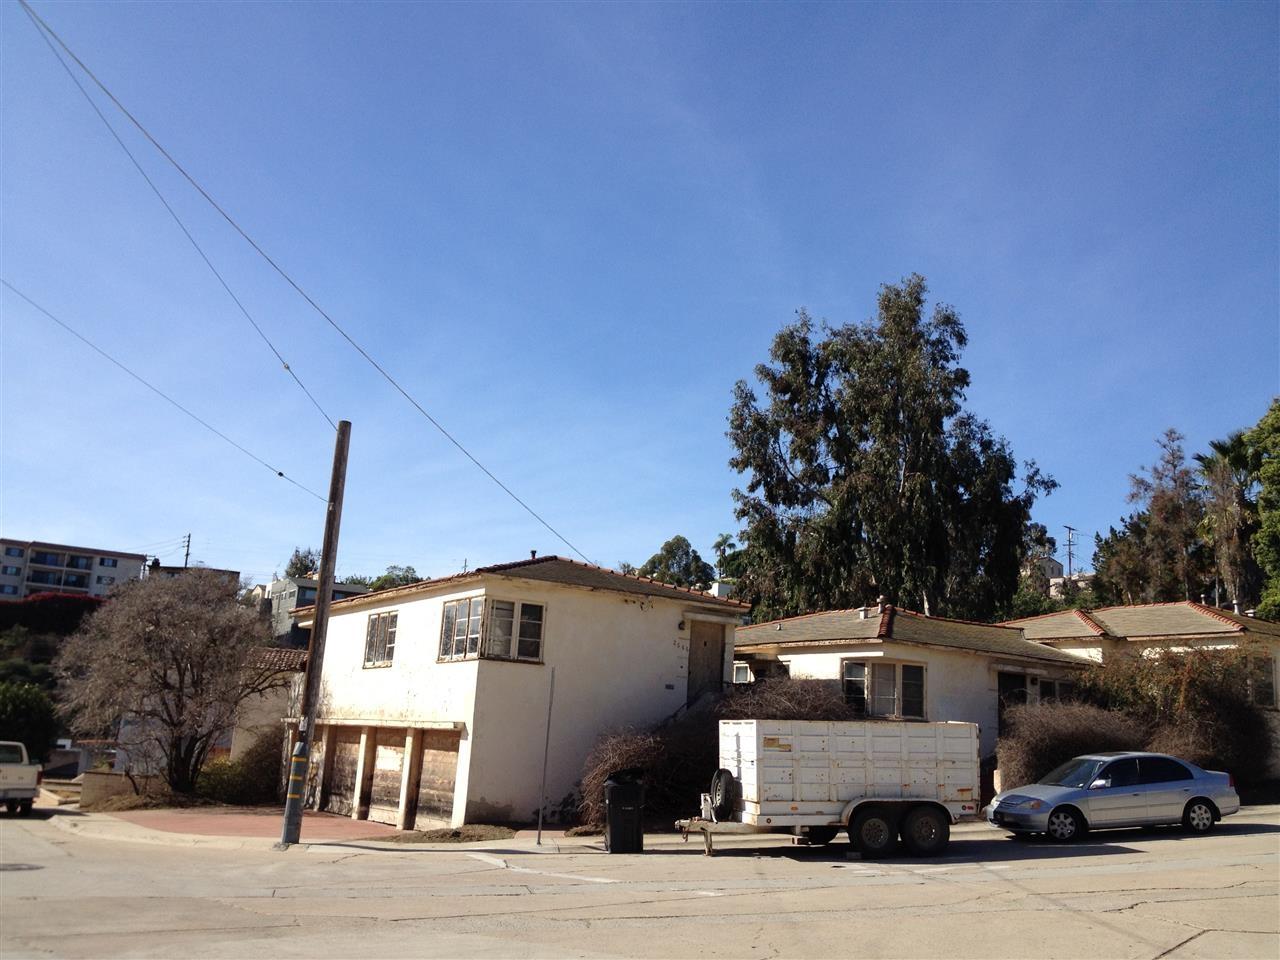 2666-2670 Dove St. -  San Diego, CA 92103